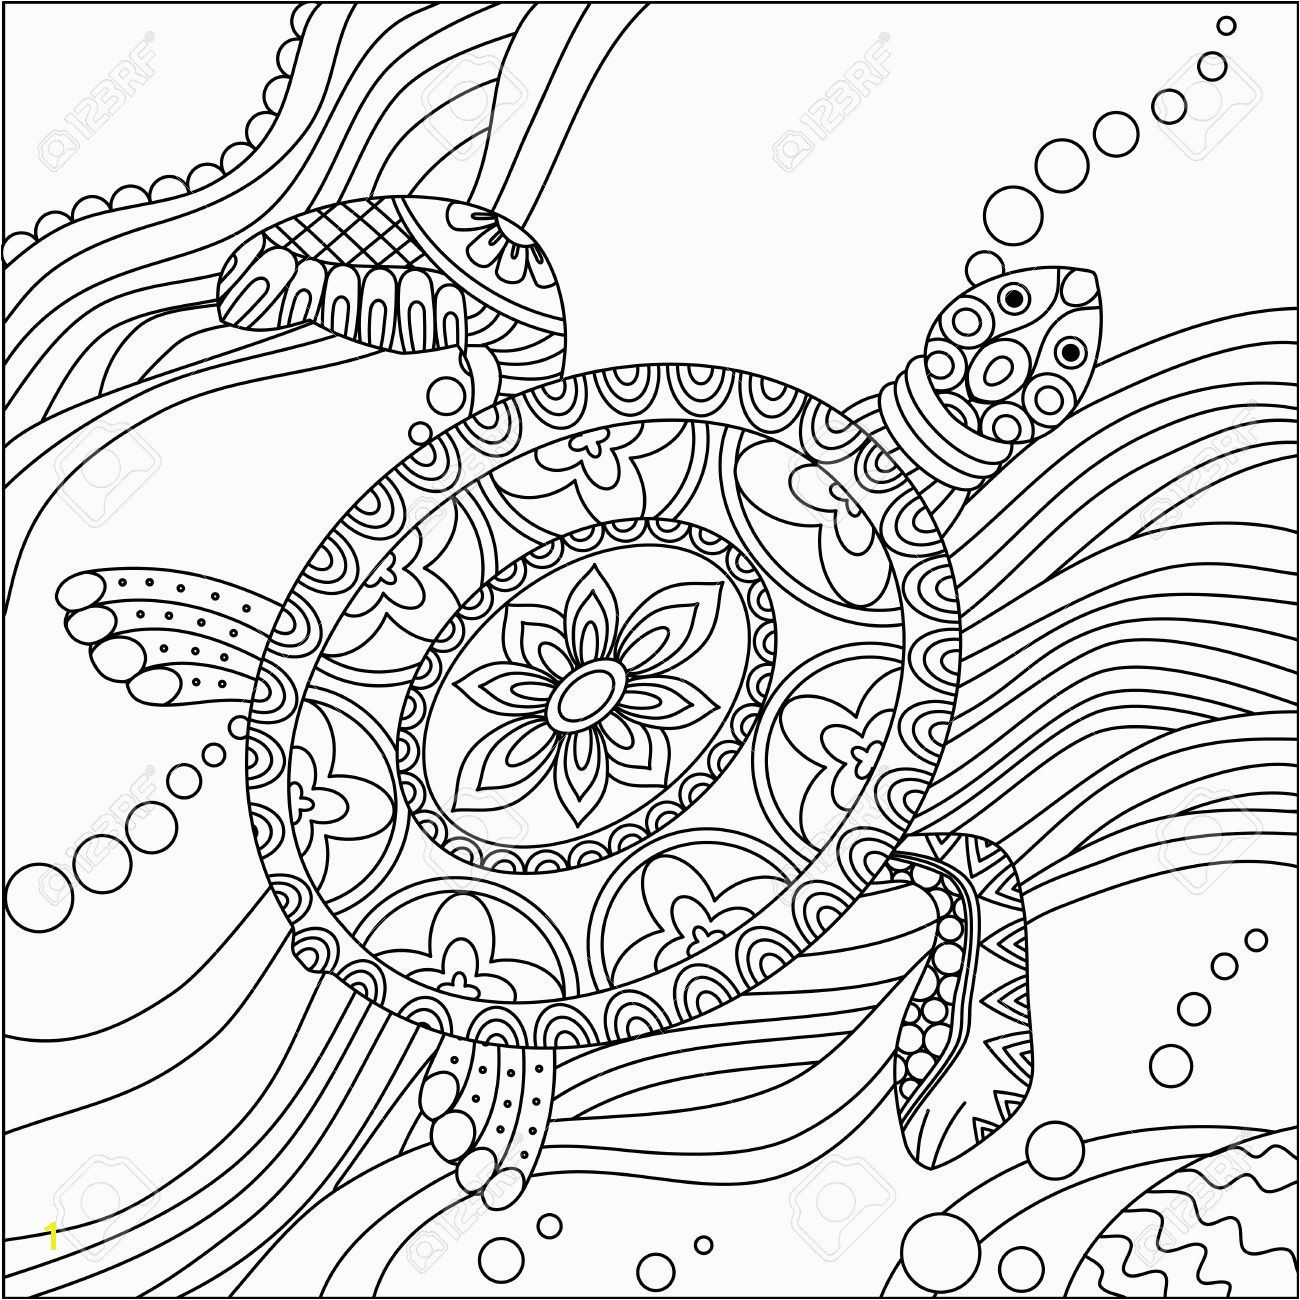 Turtle Mandala Coloring Pages Printable Turtle Coloring Pages for Adults Turtles Coloring Pages Free New Sea